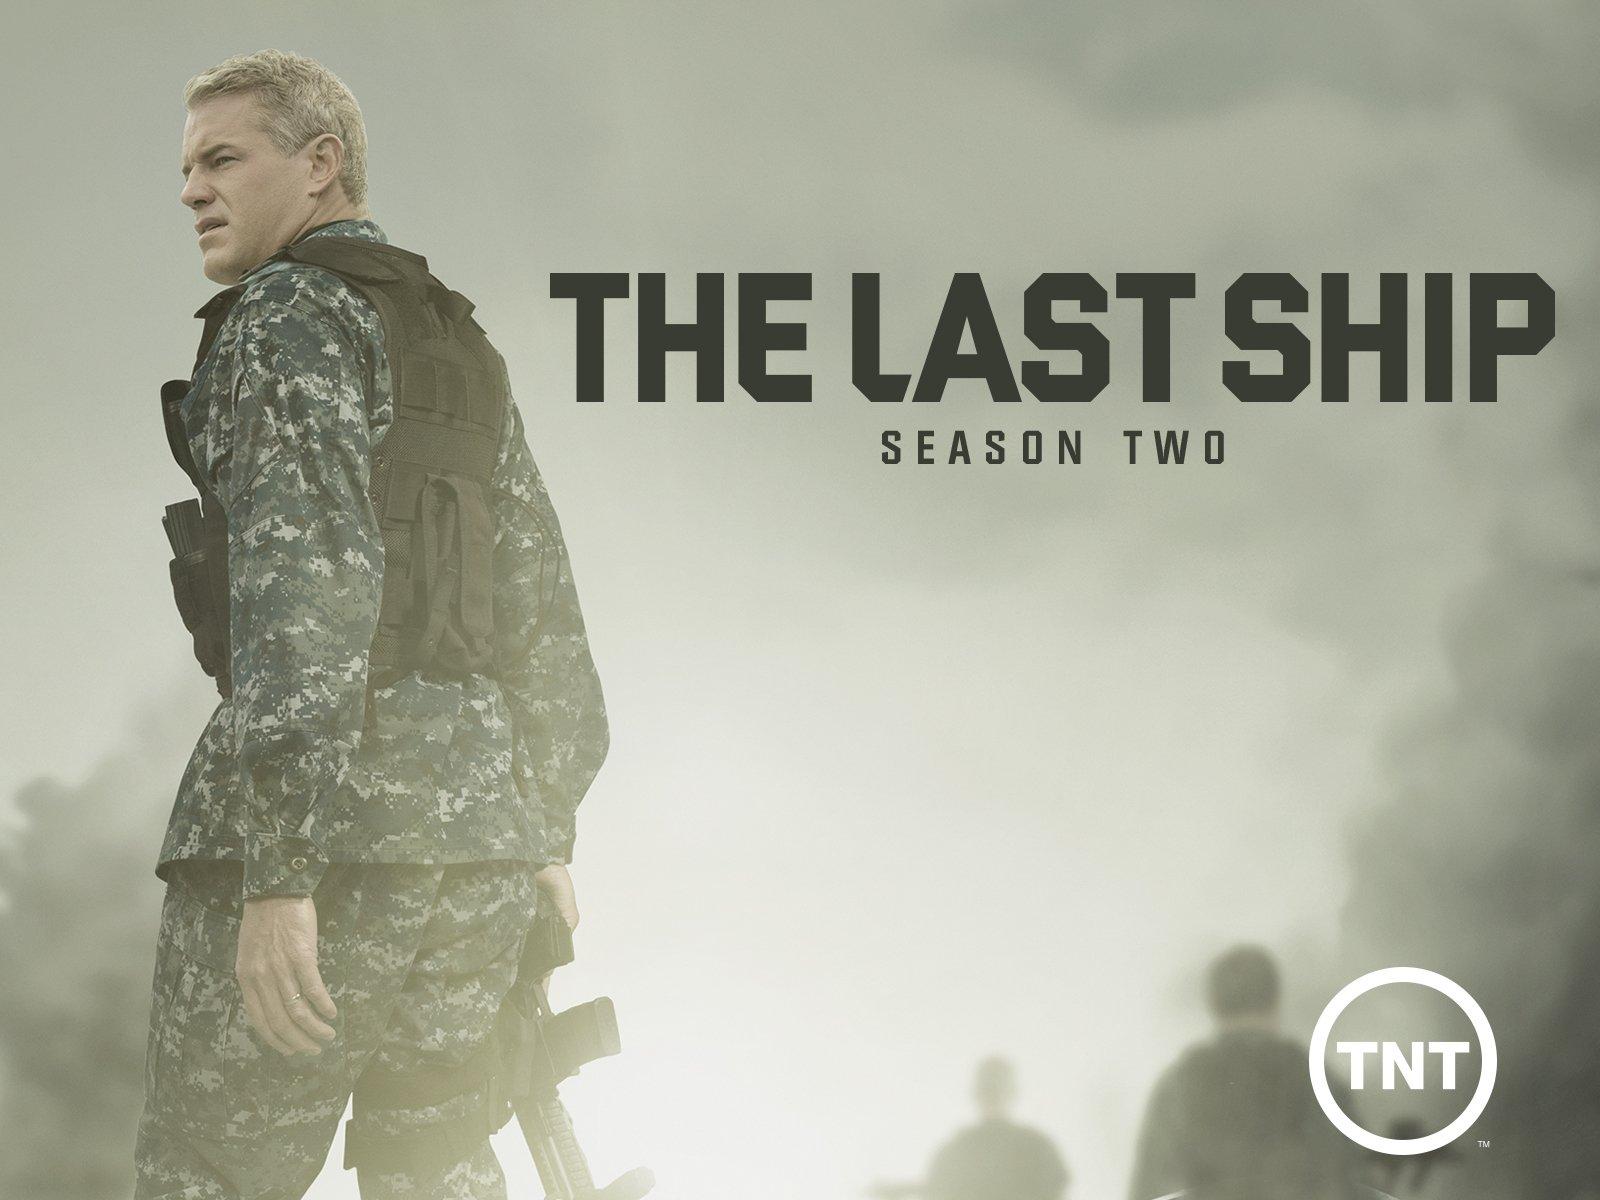 The Last Ship Season 2 ฐานทัพสุดท้าย เชื้อร้ายถล่มโลก ปี 2 พากย์ไทย EP1 – EP13 [จบ]